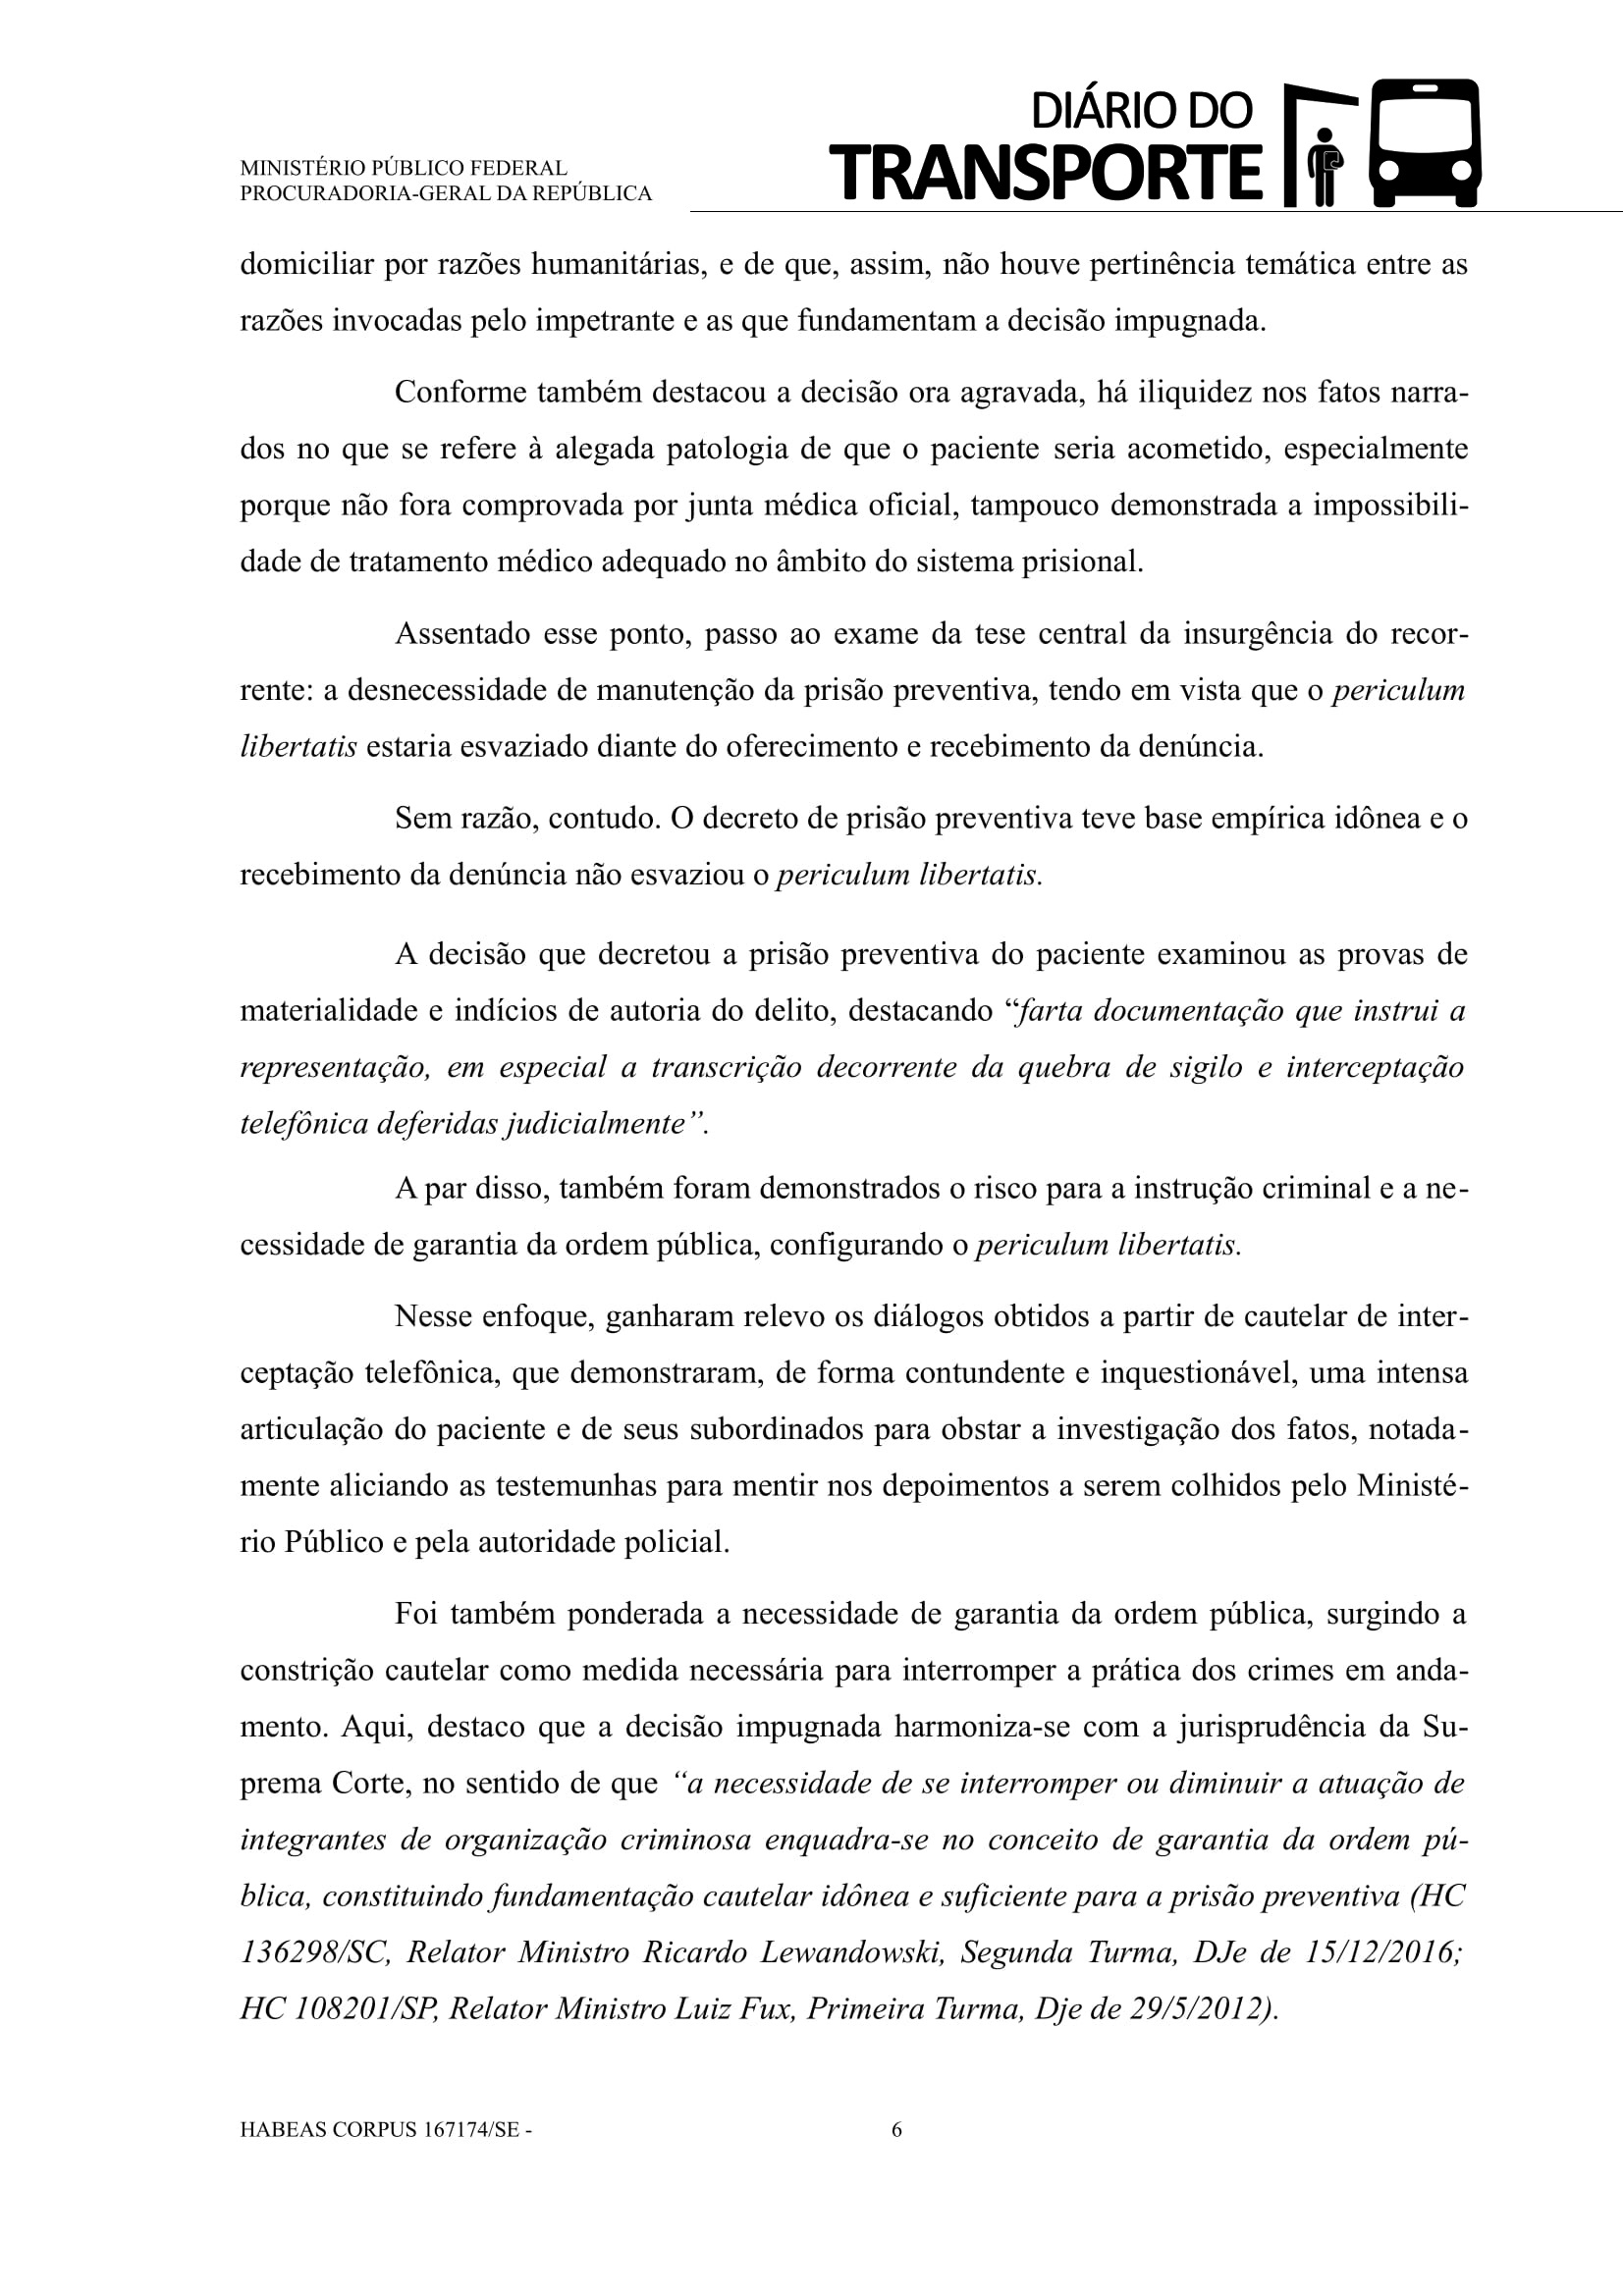 HC 167174_ContrarrazoesAgravo_Jose Valdevan de Jesus Santos-06